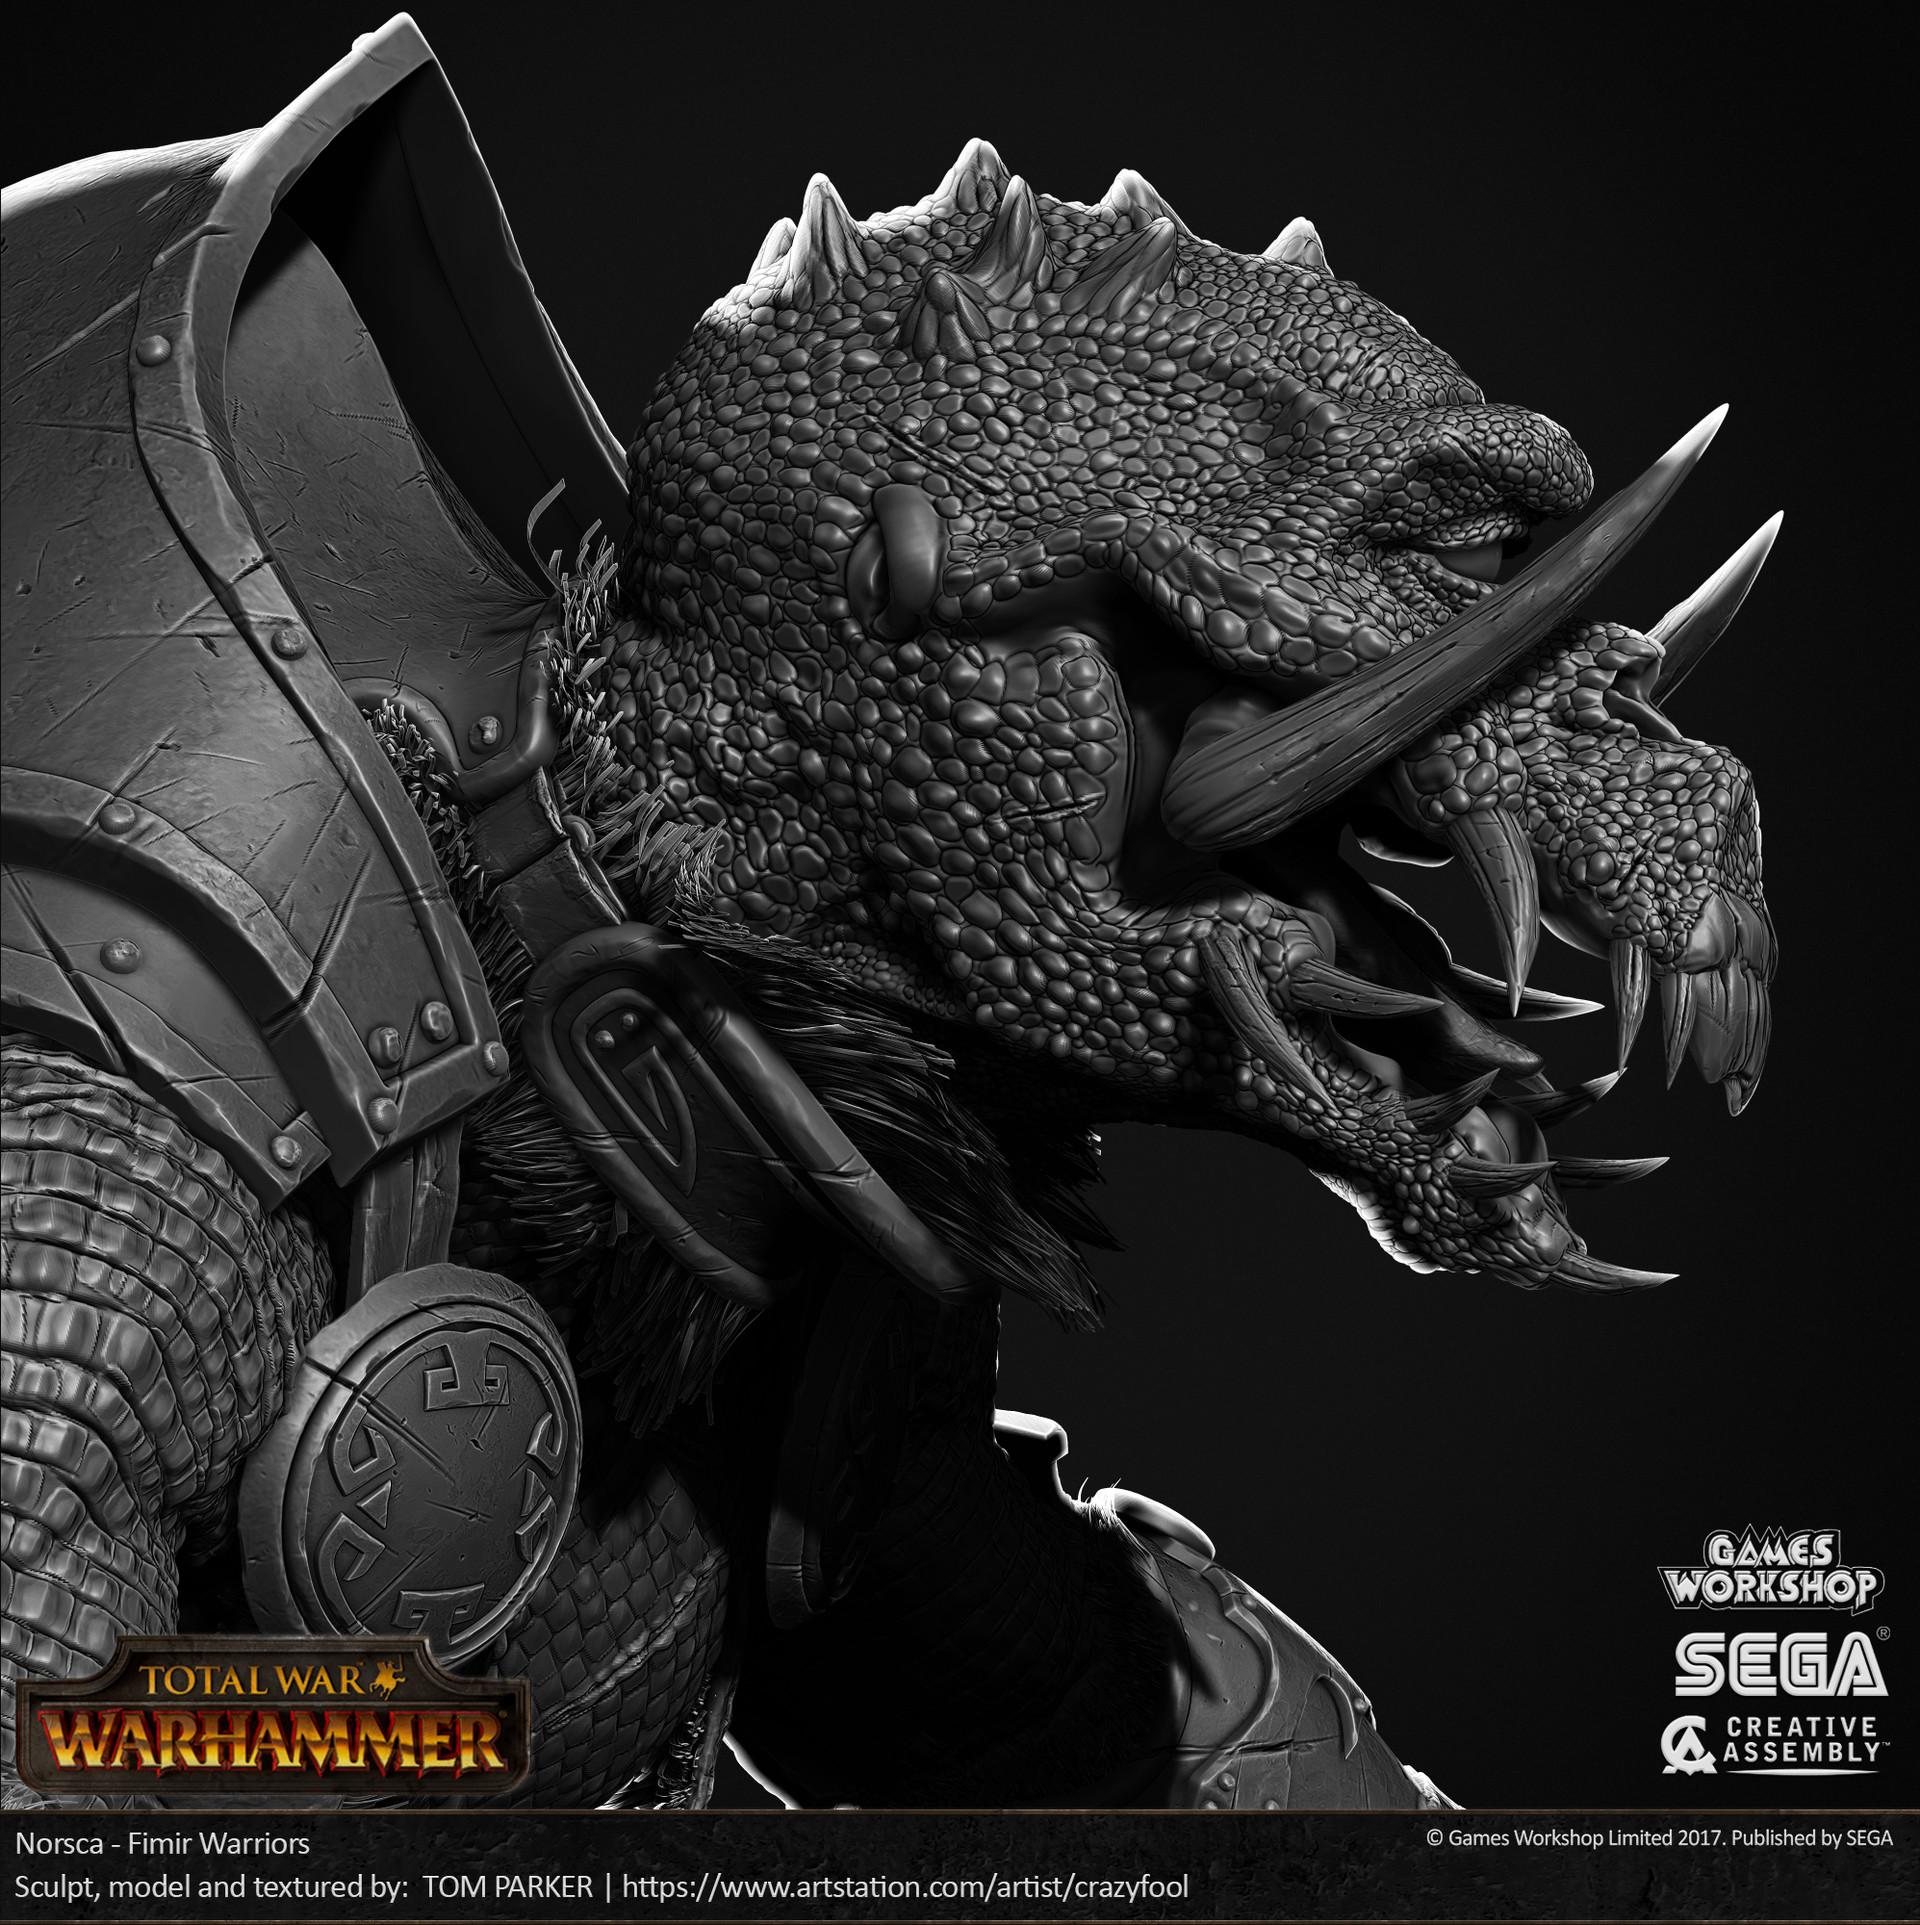 Total War : Warhammer - Page 5 Tom-parker-tomp-nor-fimir-warrior-hp-05